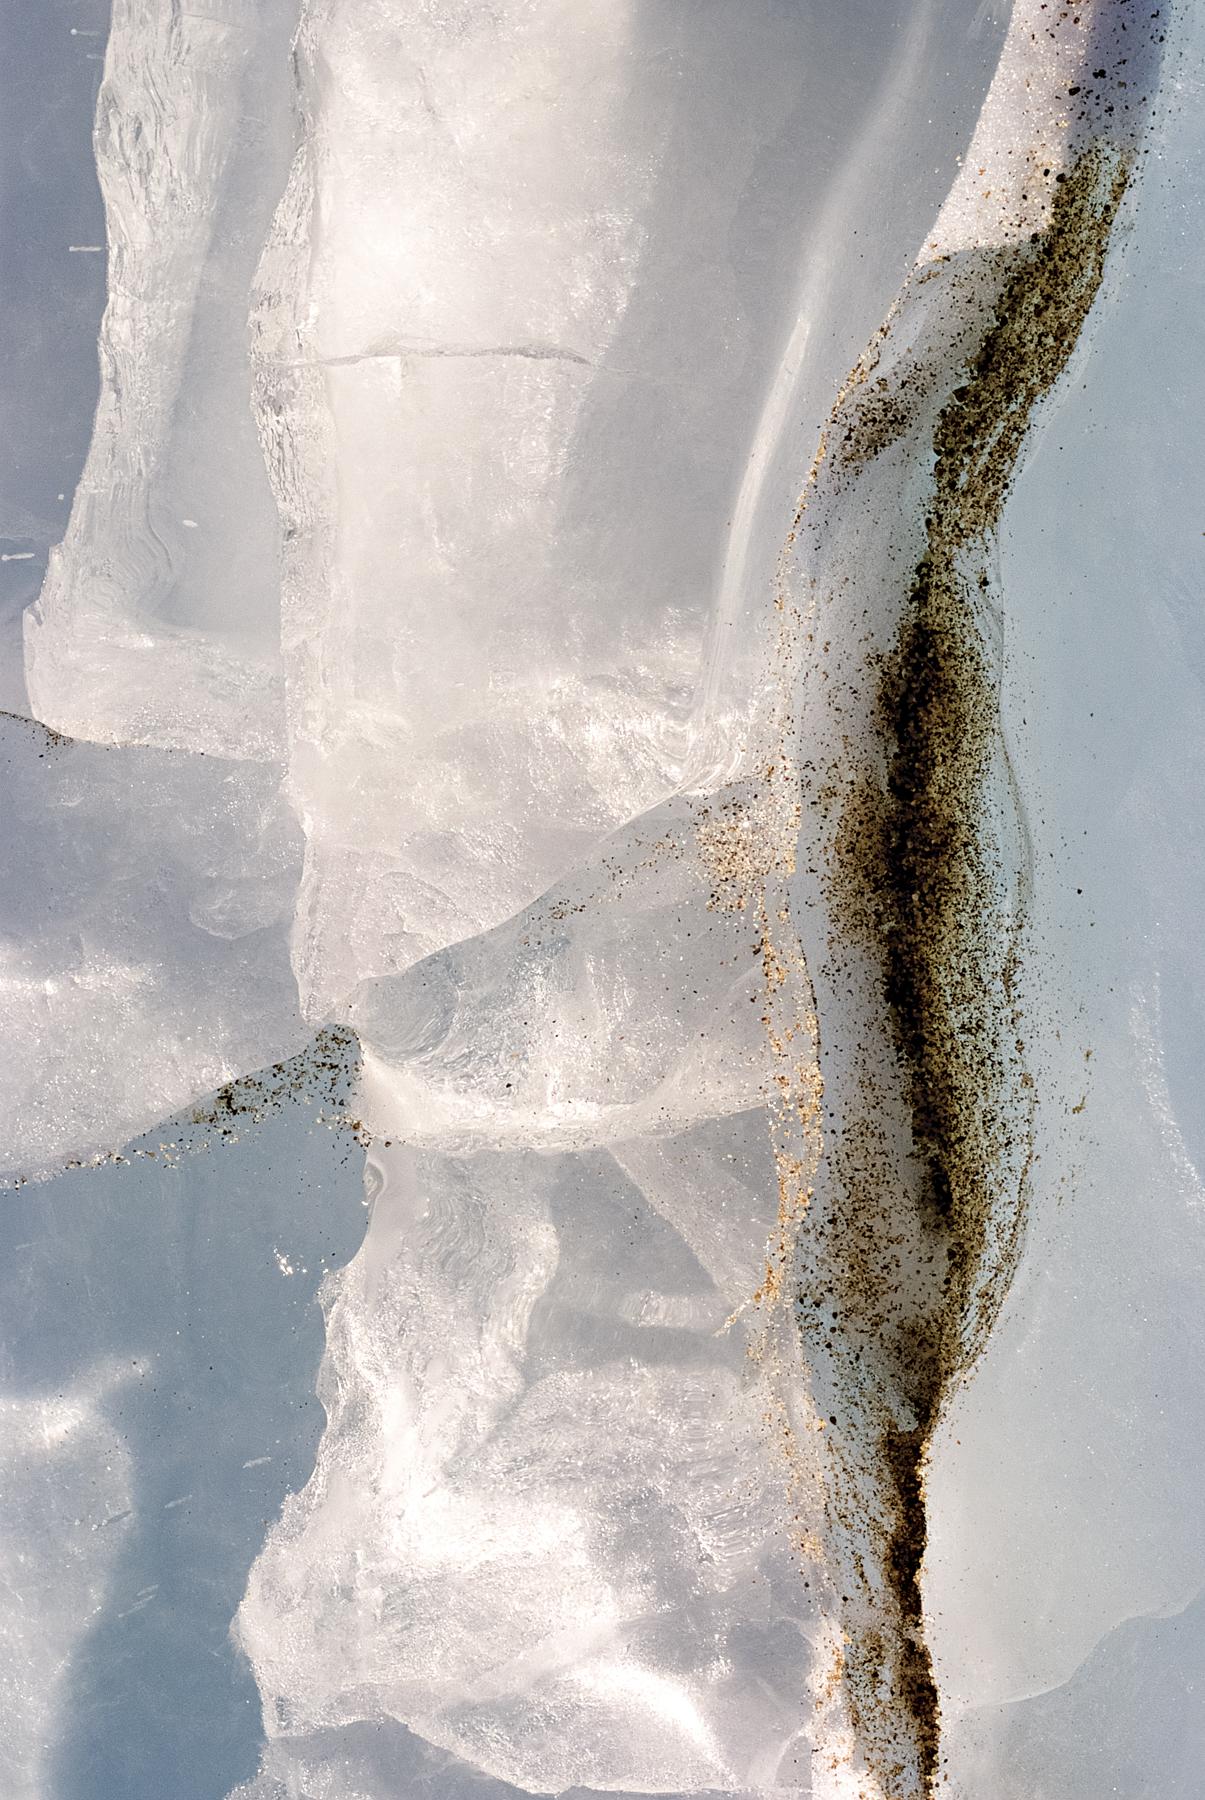 Silt and Ice, Lake Vanda